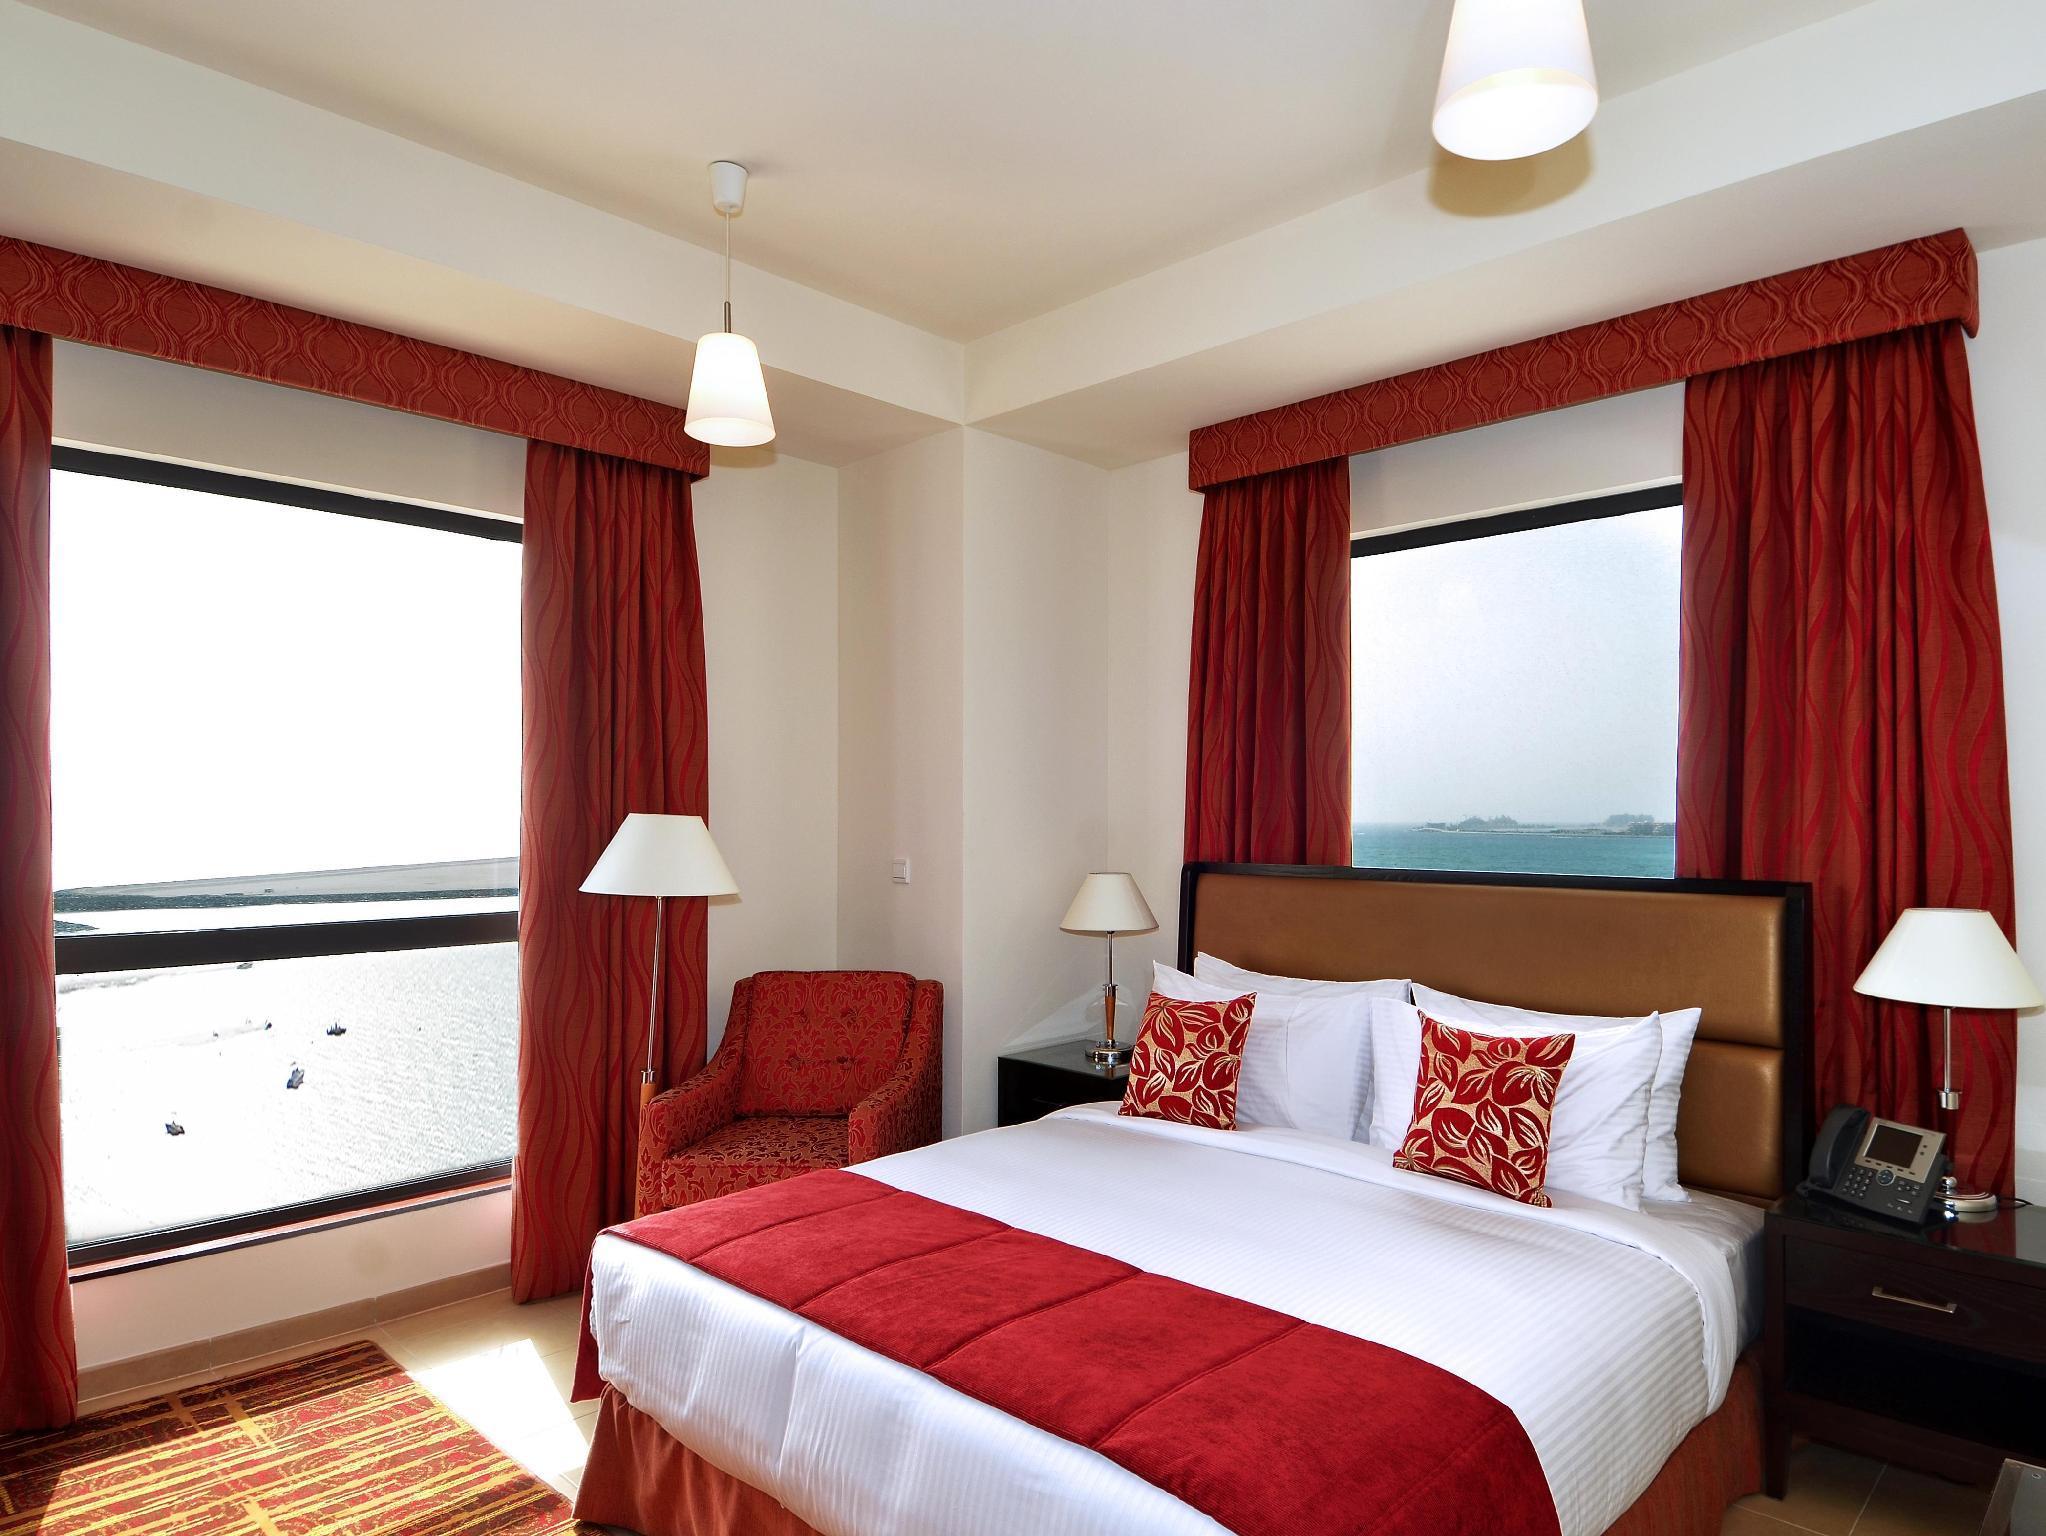 Amwaj suites jumeirah beach residence, dubai   boek een aanbieding ...